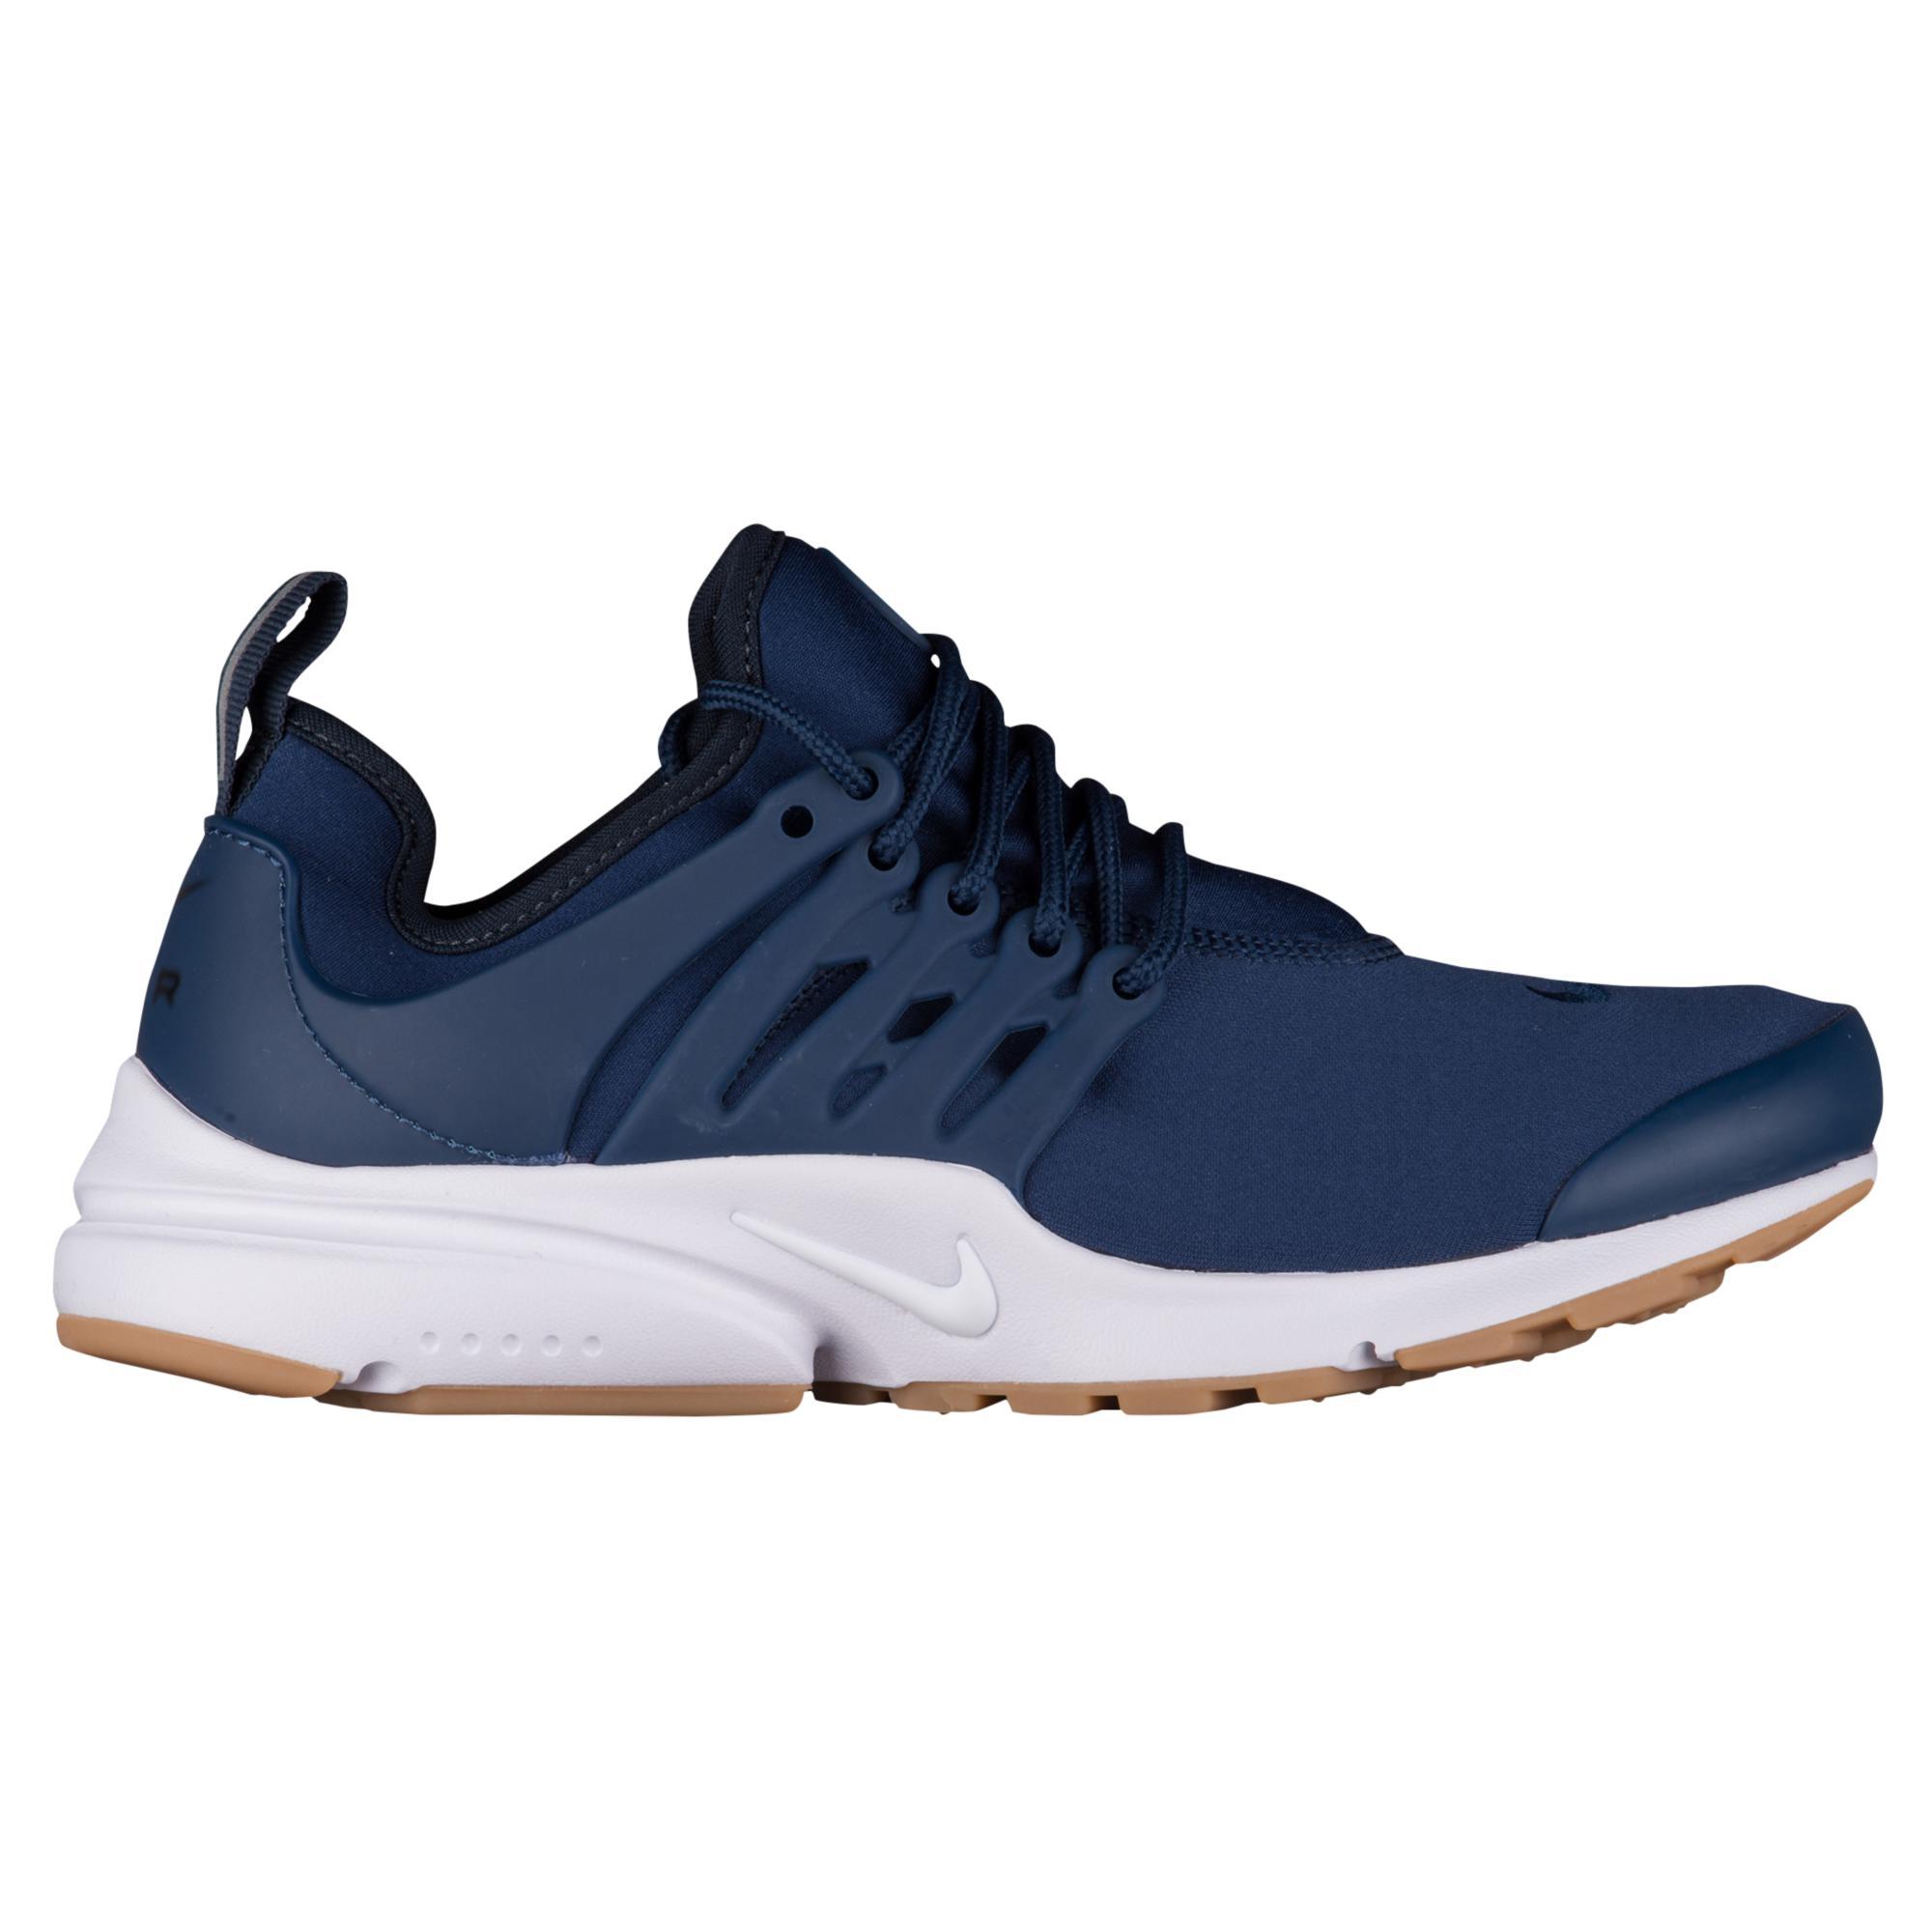 00302e484758 Lyst - Nike Air Presto in Blue